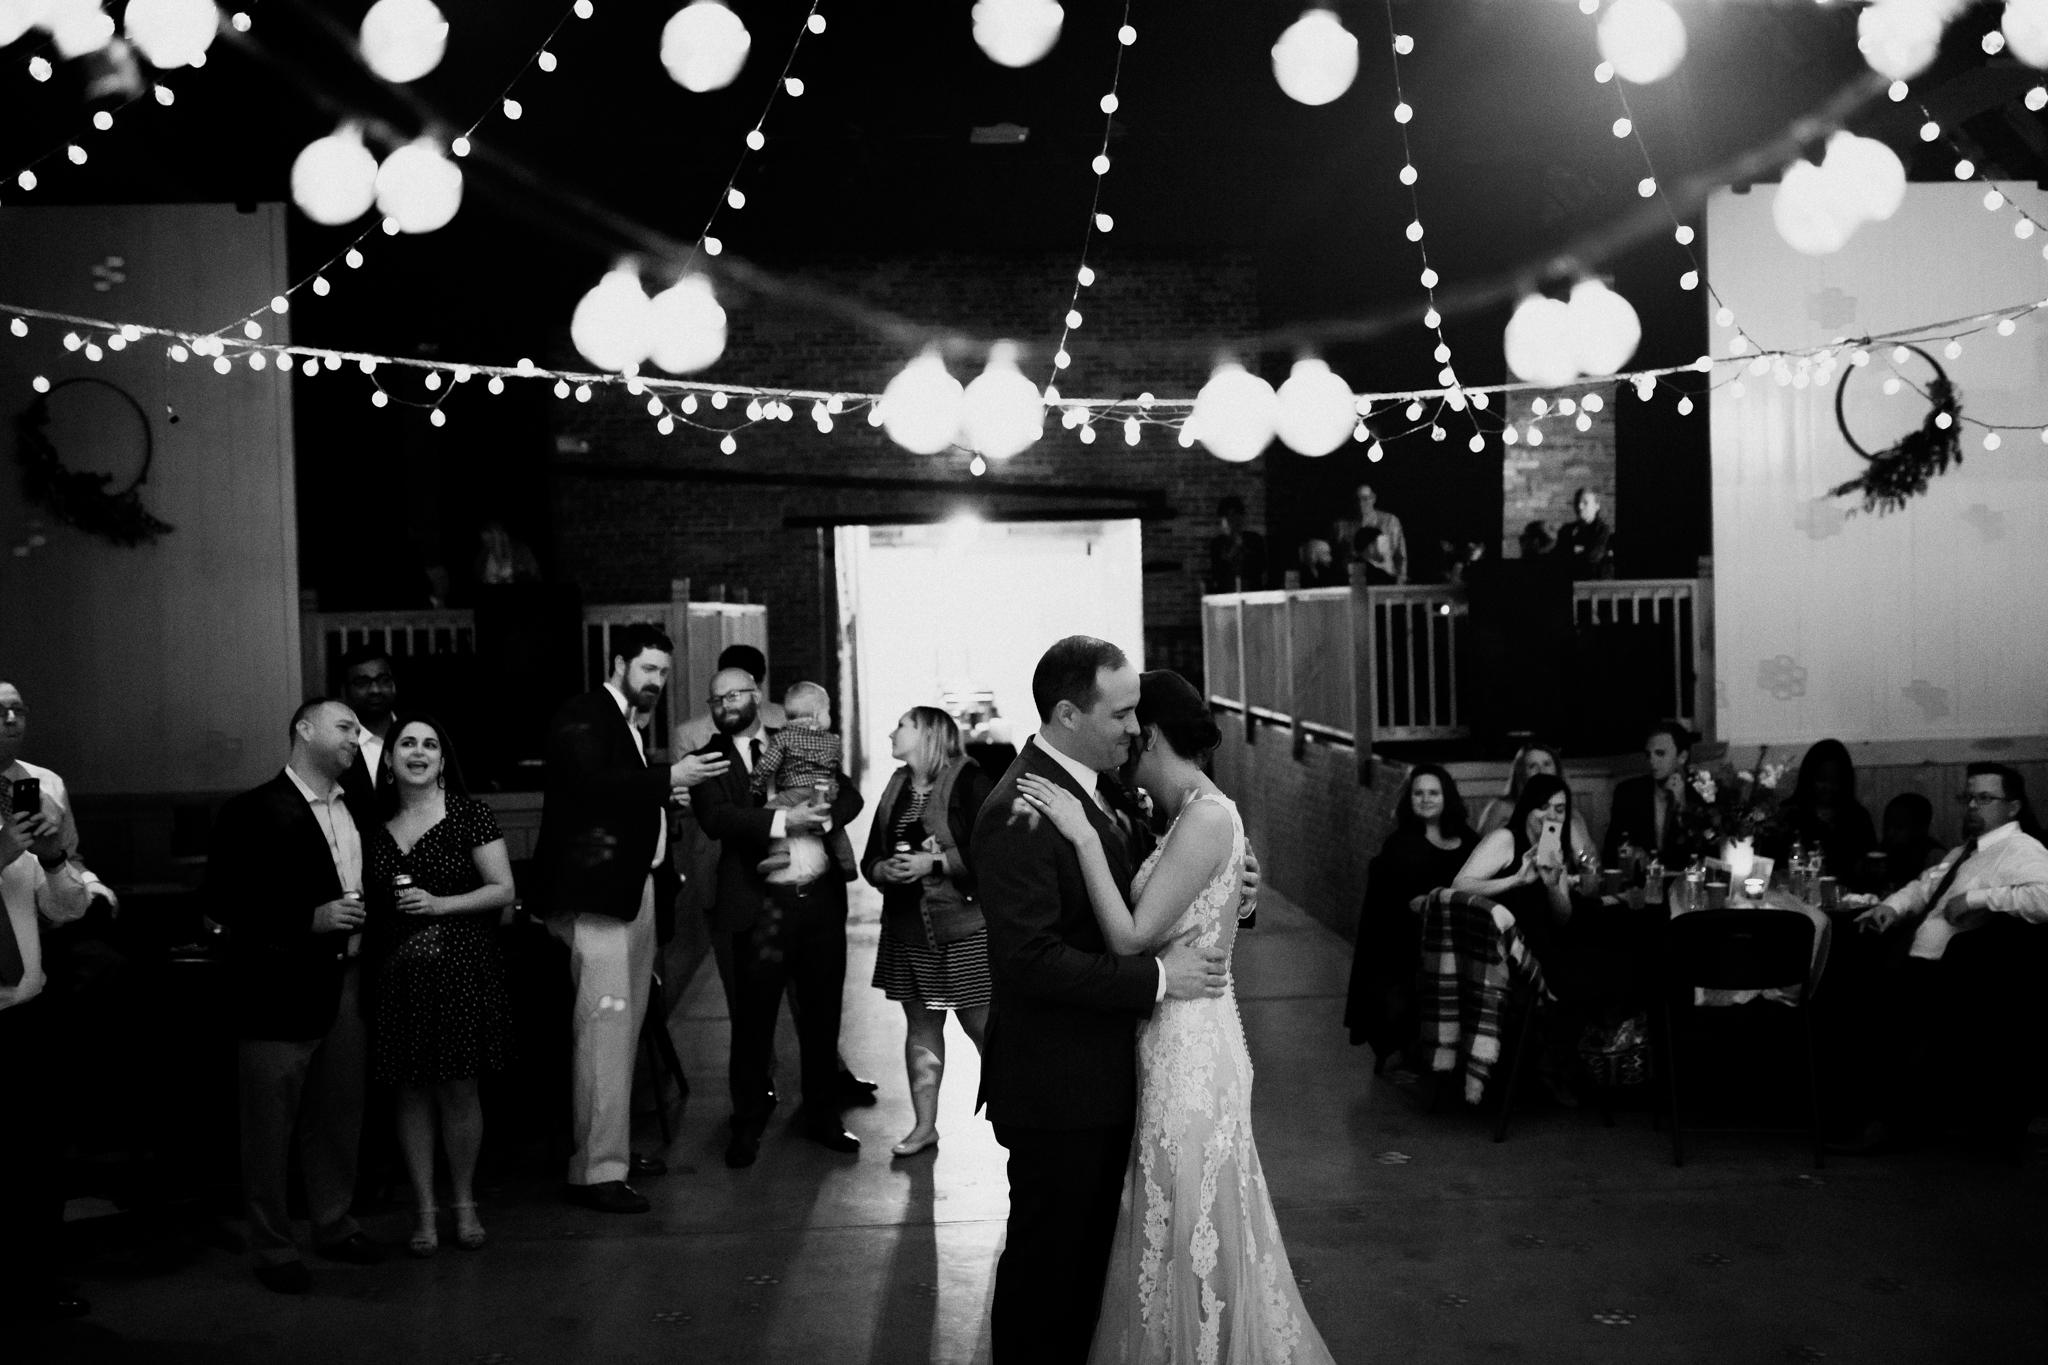 birmingham-alabama-wedding-photographer-laura-terry-the-warmth-around-you (88 of 110).jpg